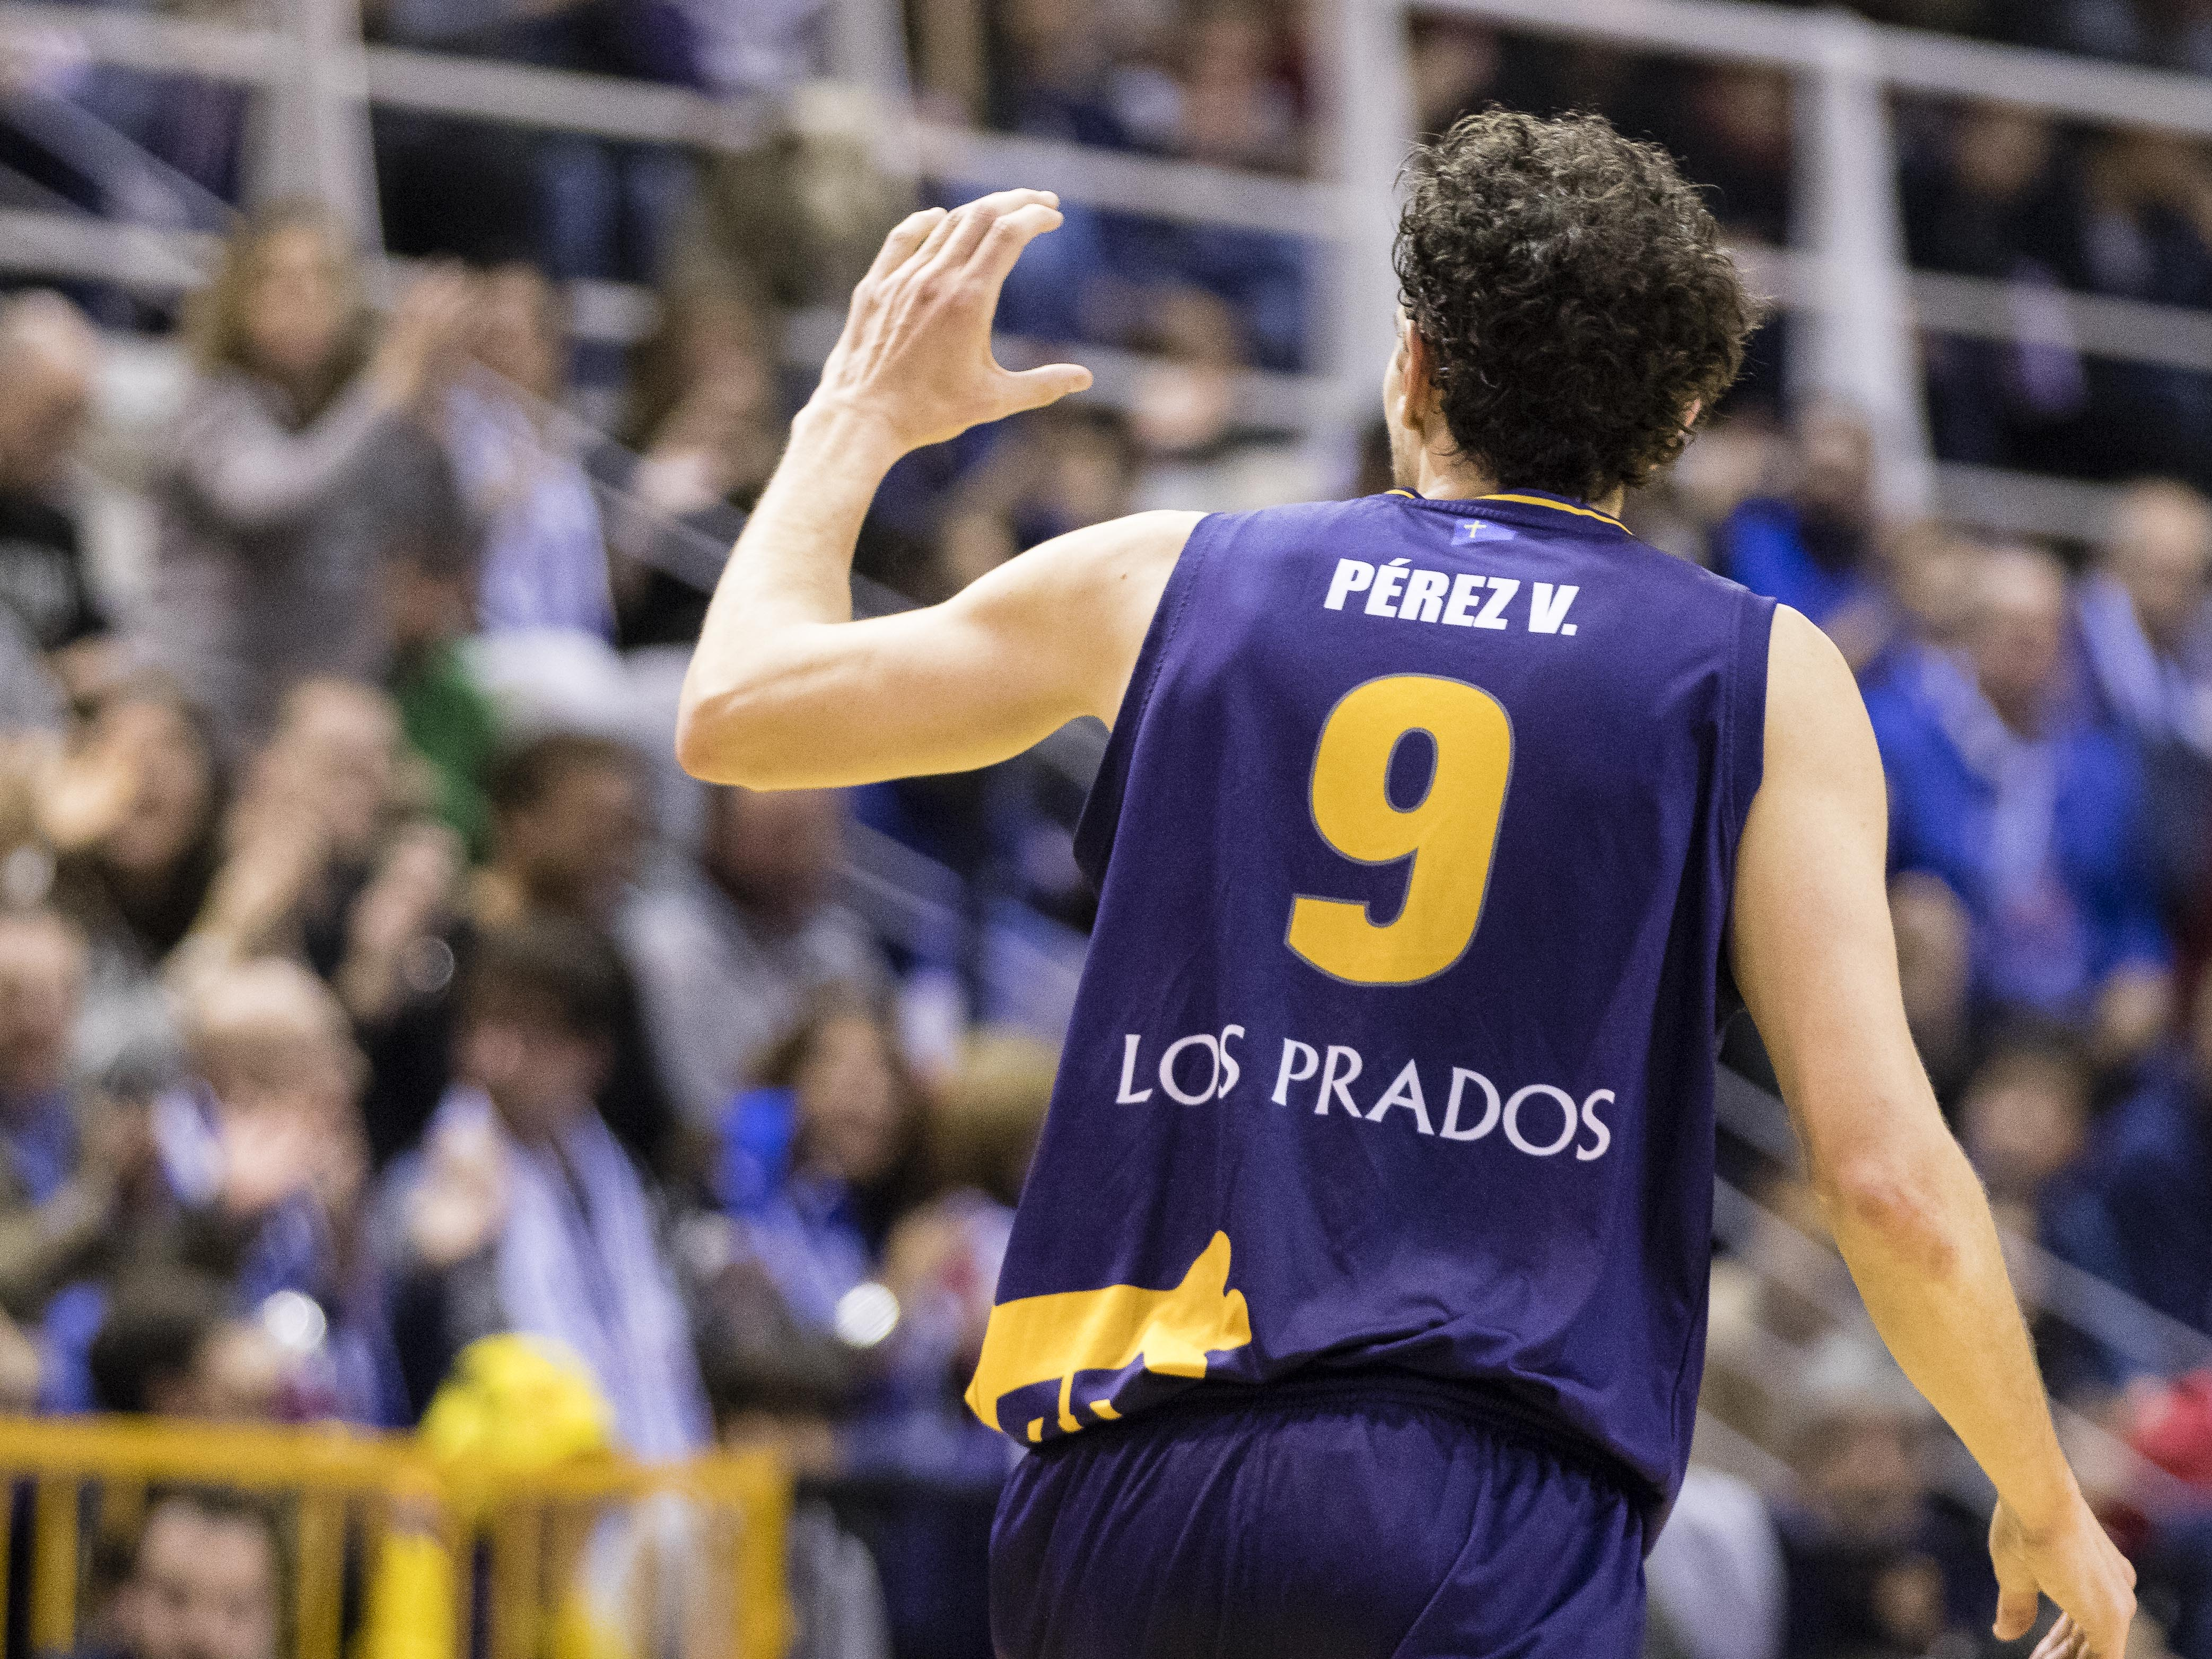 Víctor Pérez dedicando un triple (Foto: Christian García)